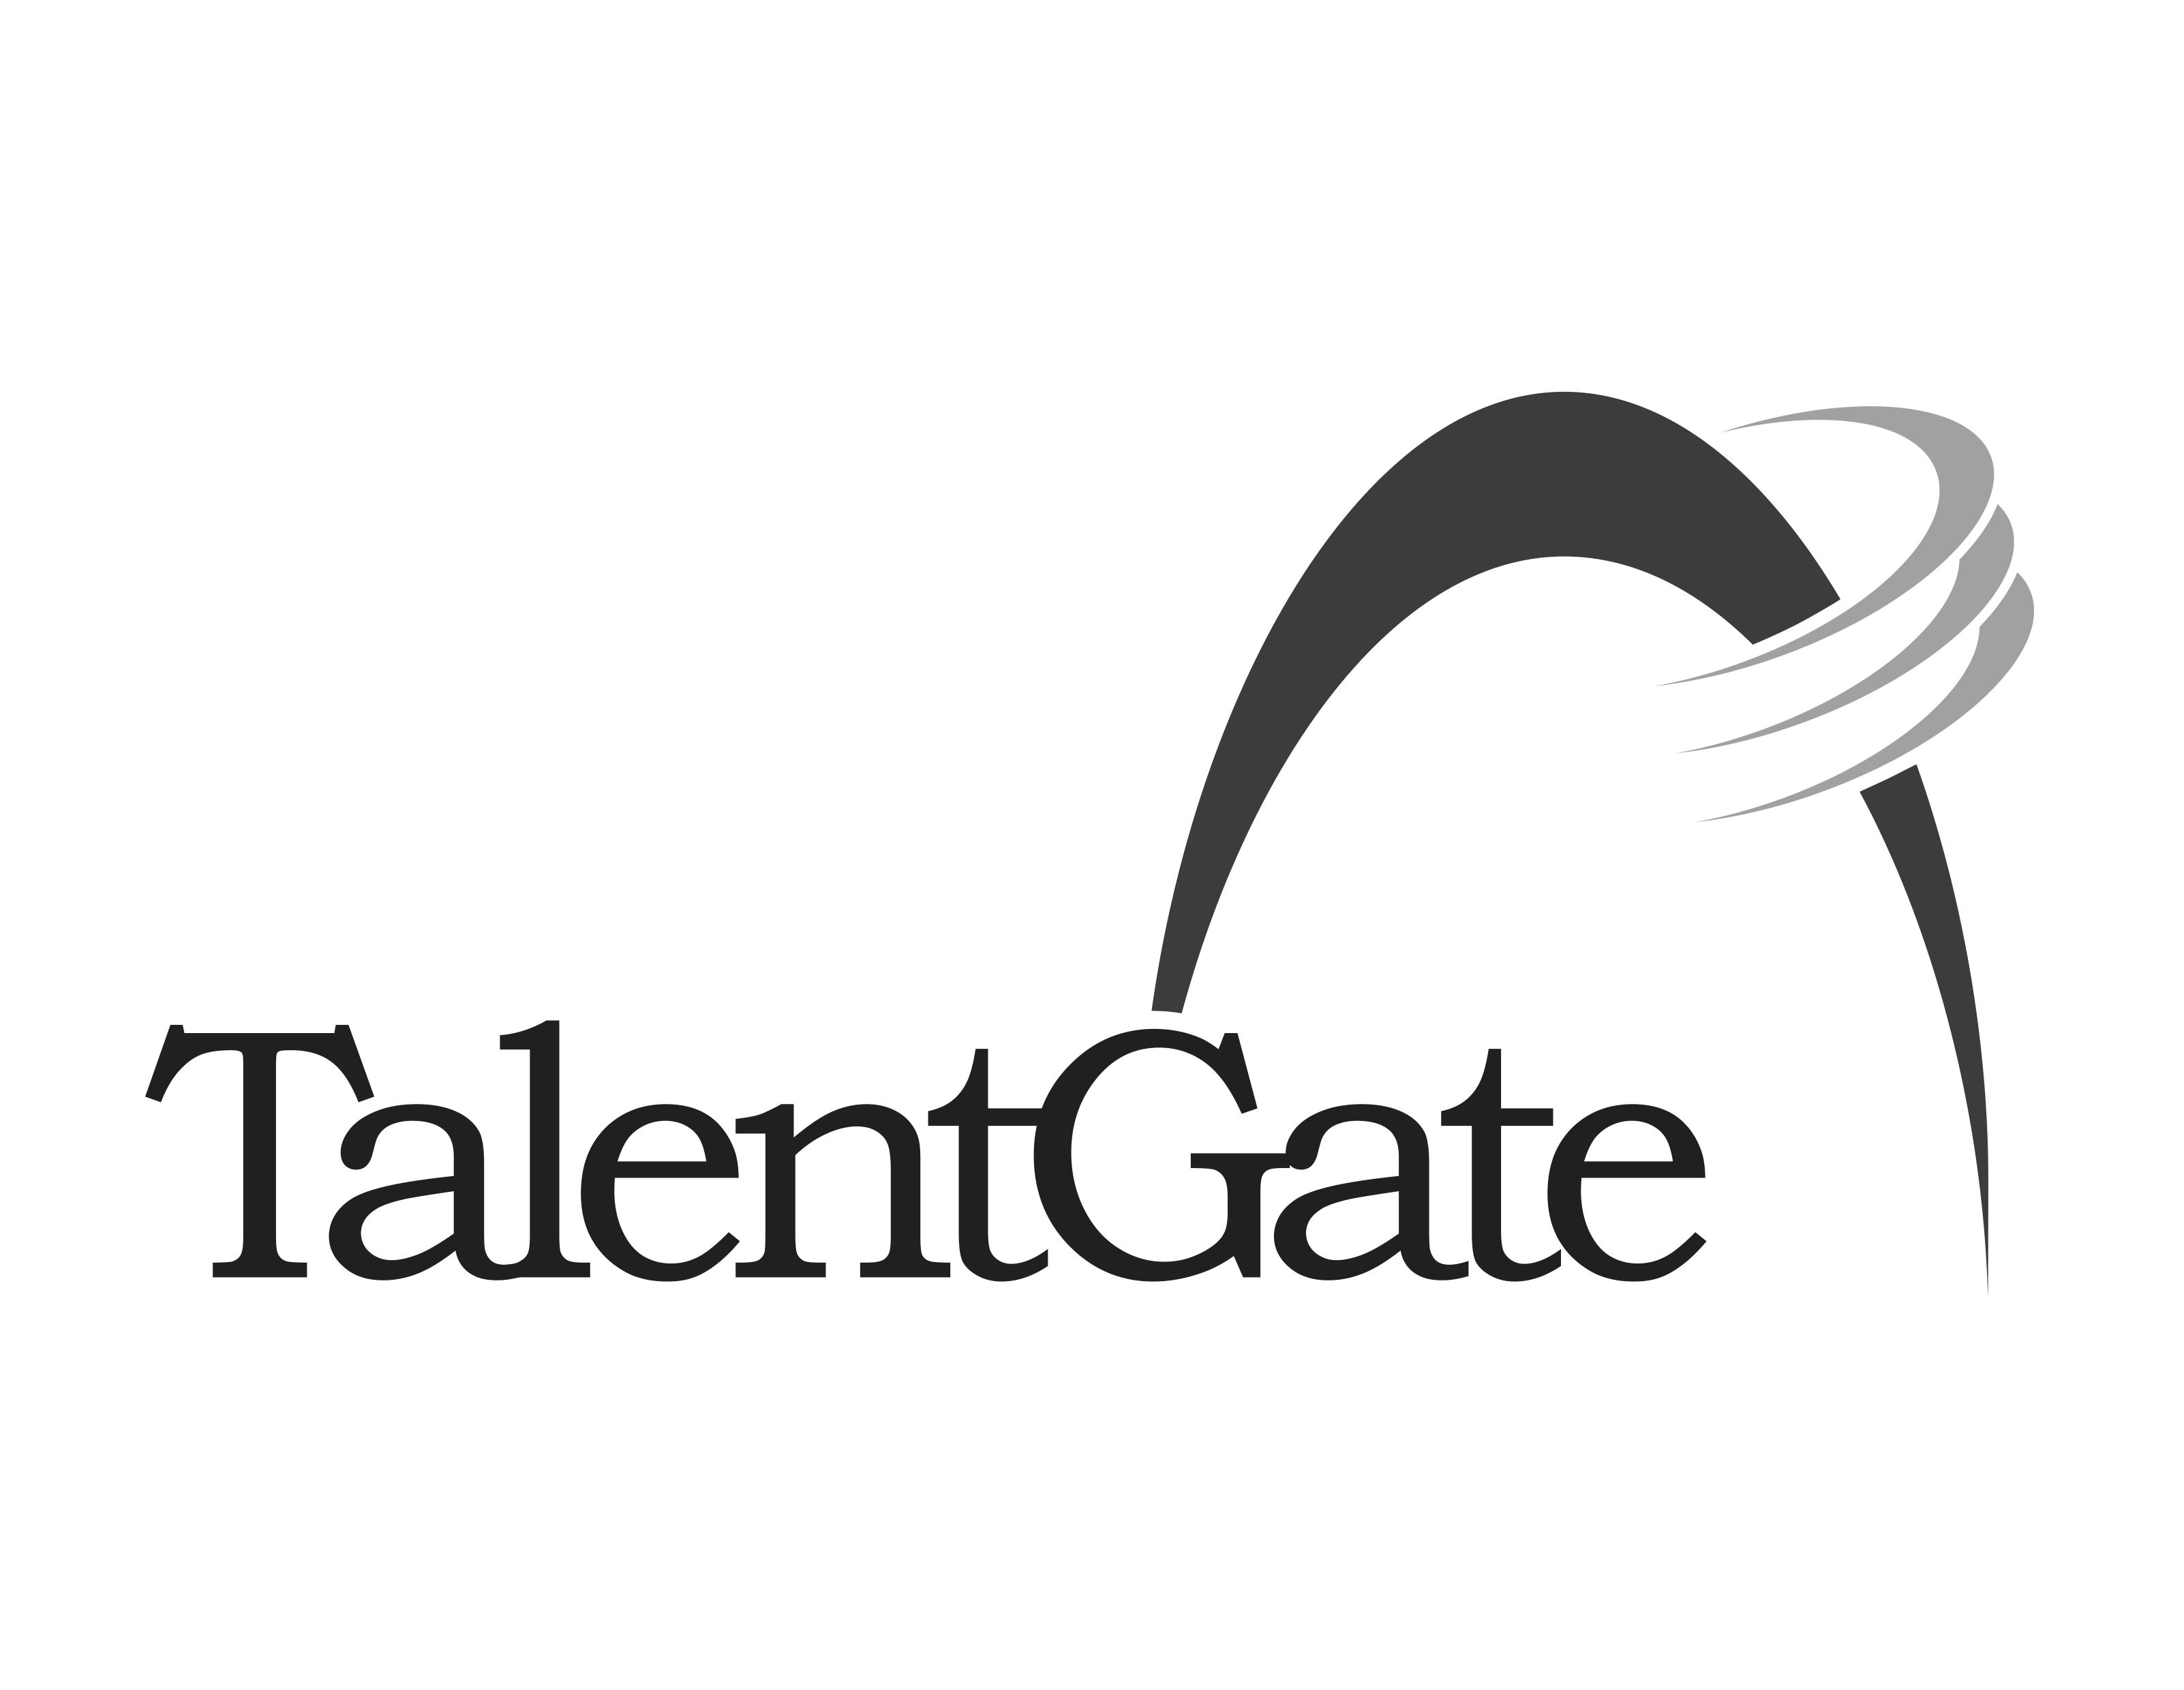 TalentGate